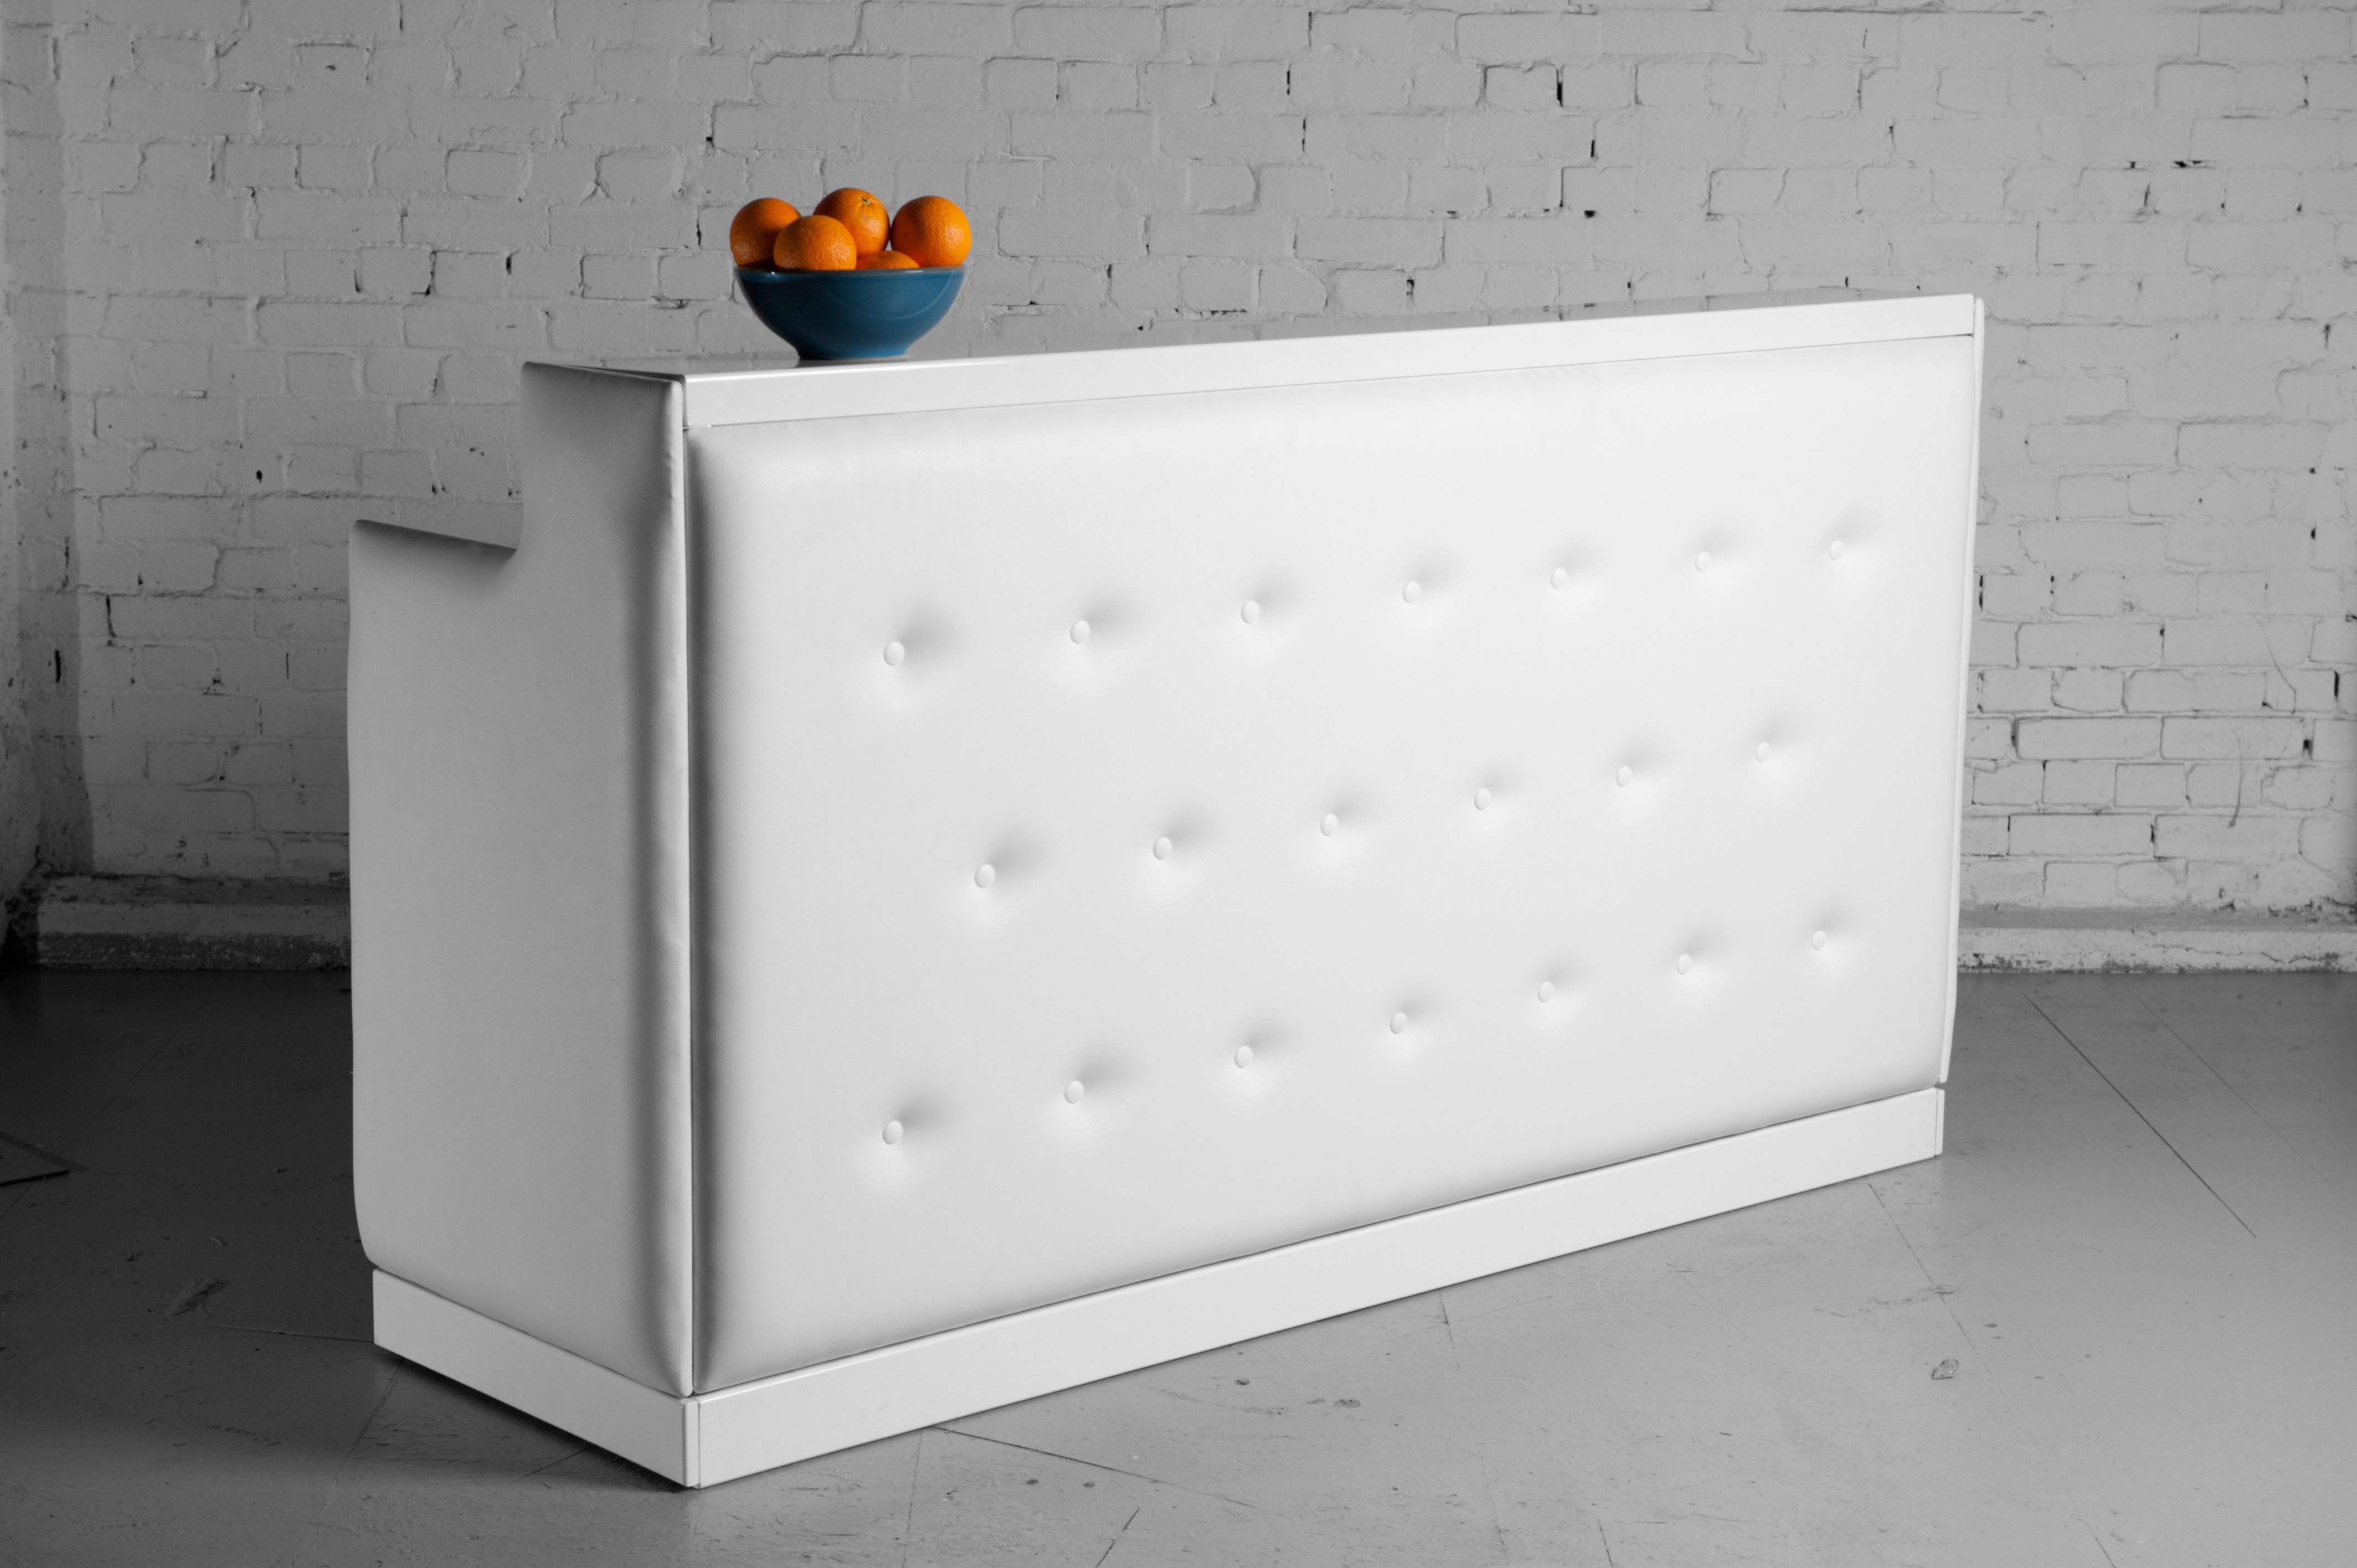 buy online 7d4e9 5da04 White padded bar long   LONDON PROP HIRE